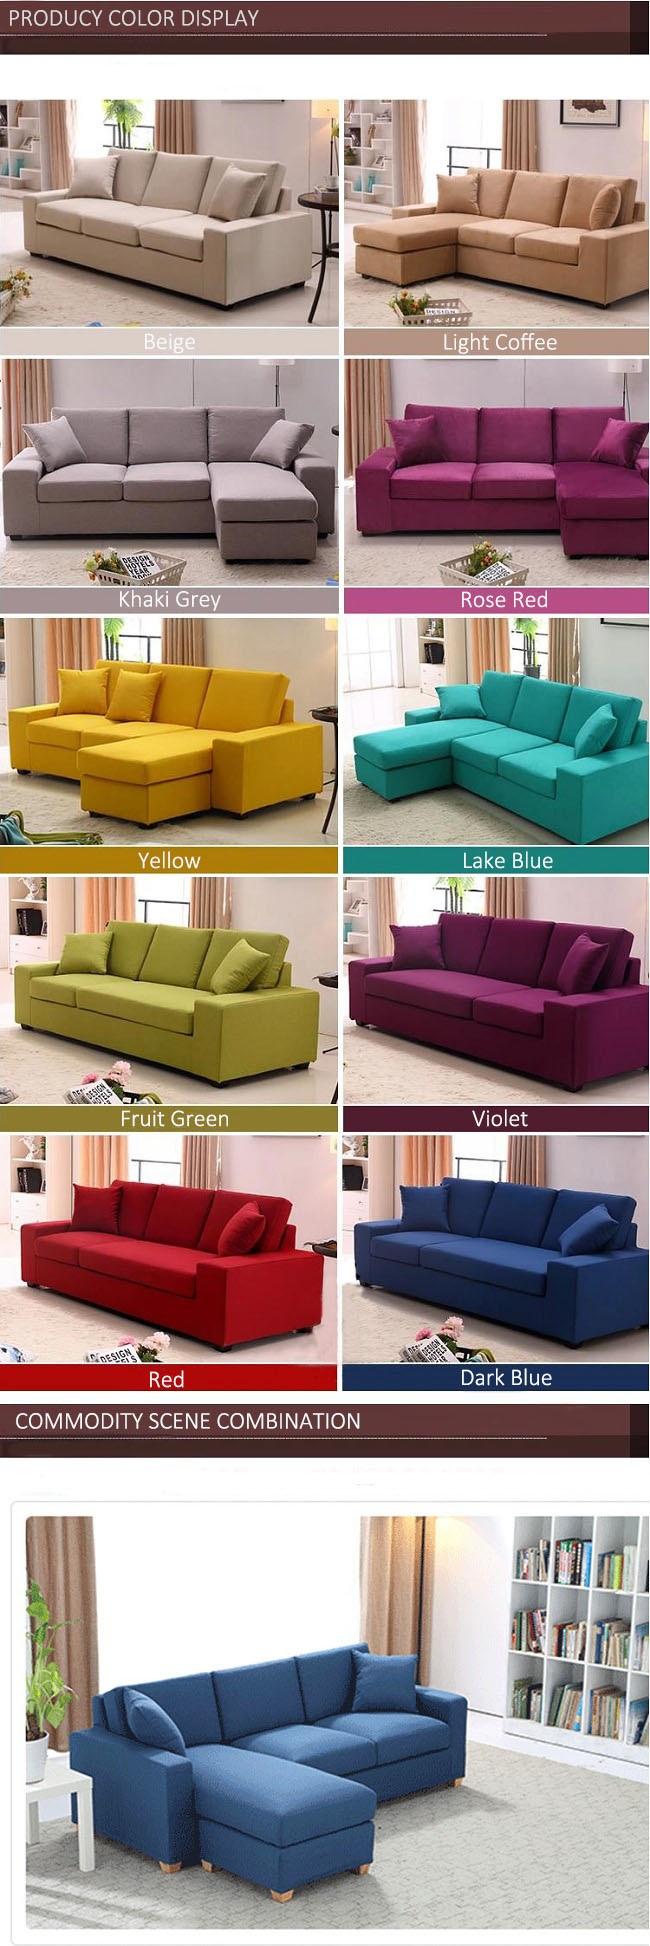 Janpanese Style Leisure Sectional Sofa Living Room Corner Washable Fabric Sofa